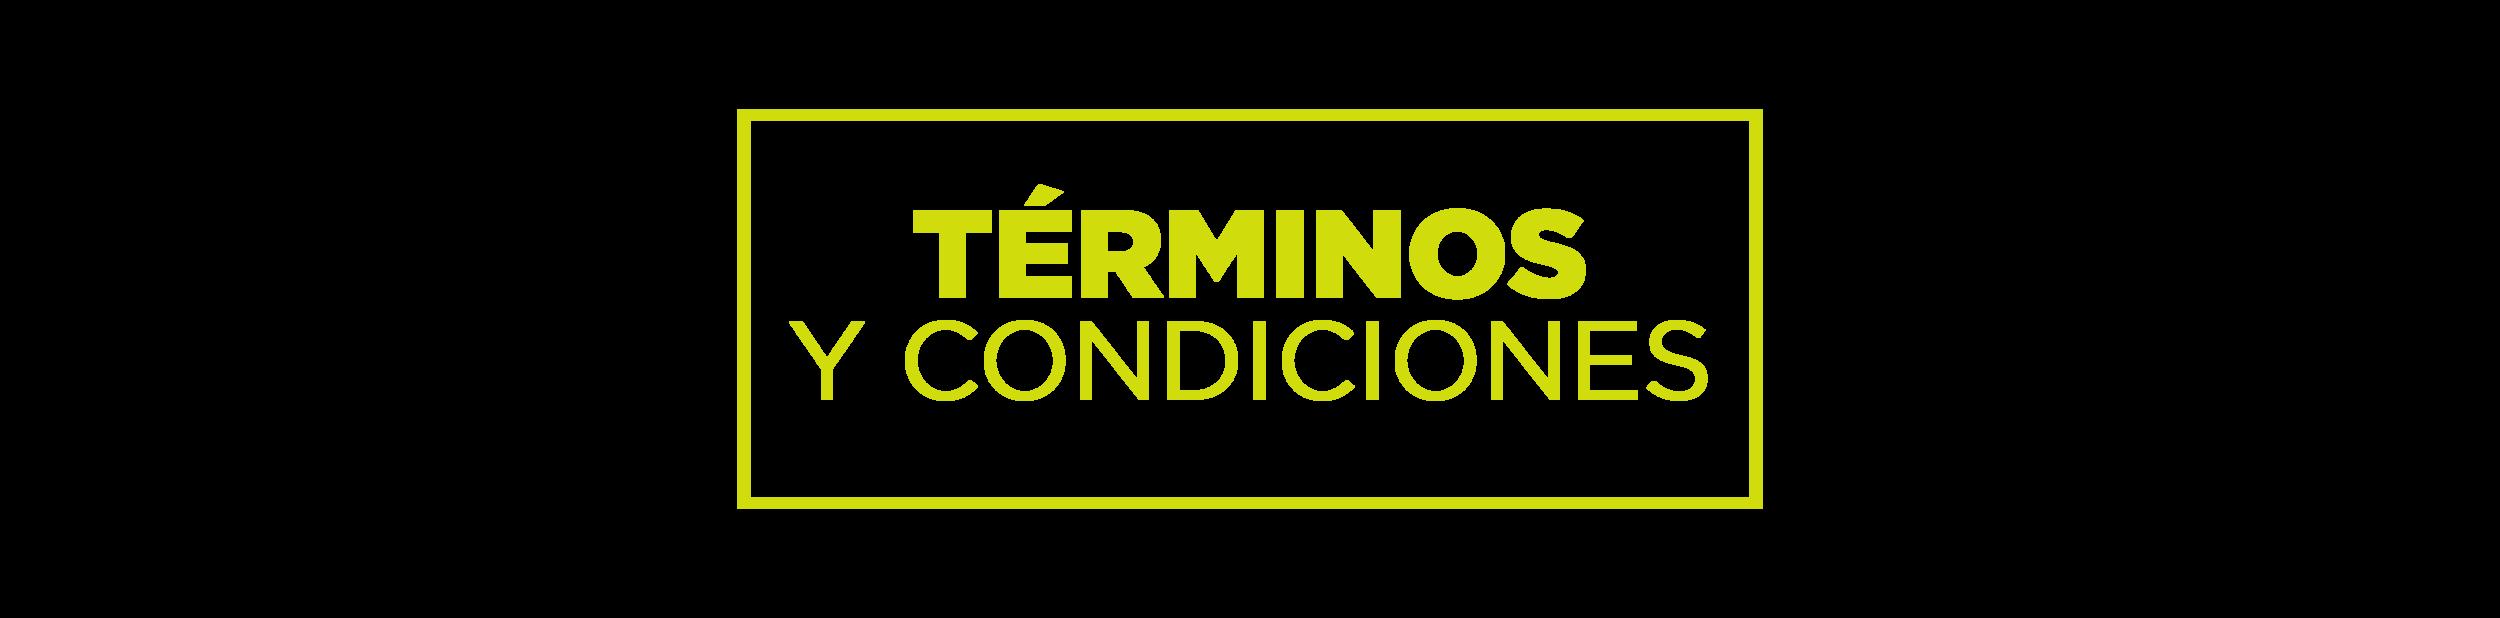 TERMINOS-13.png